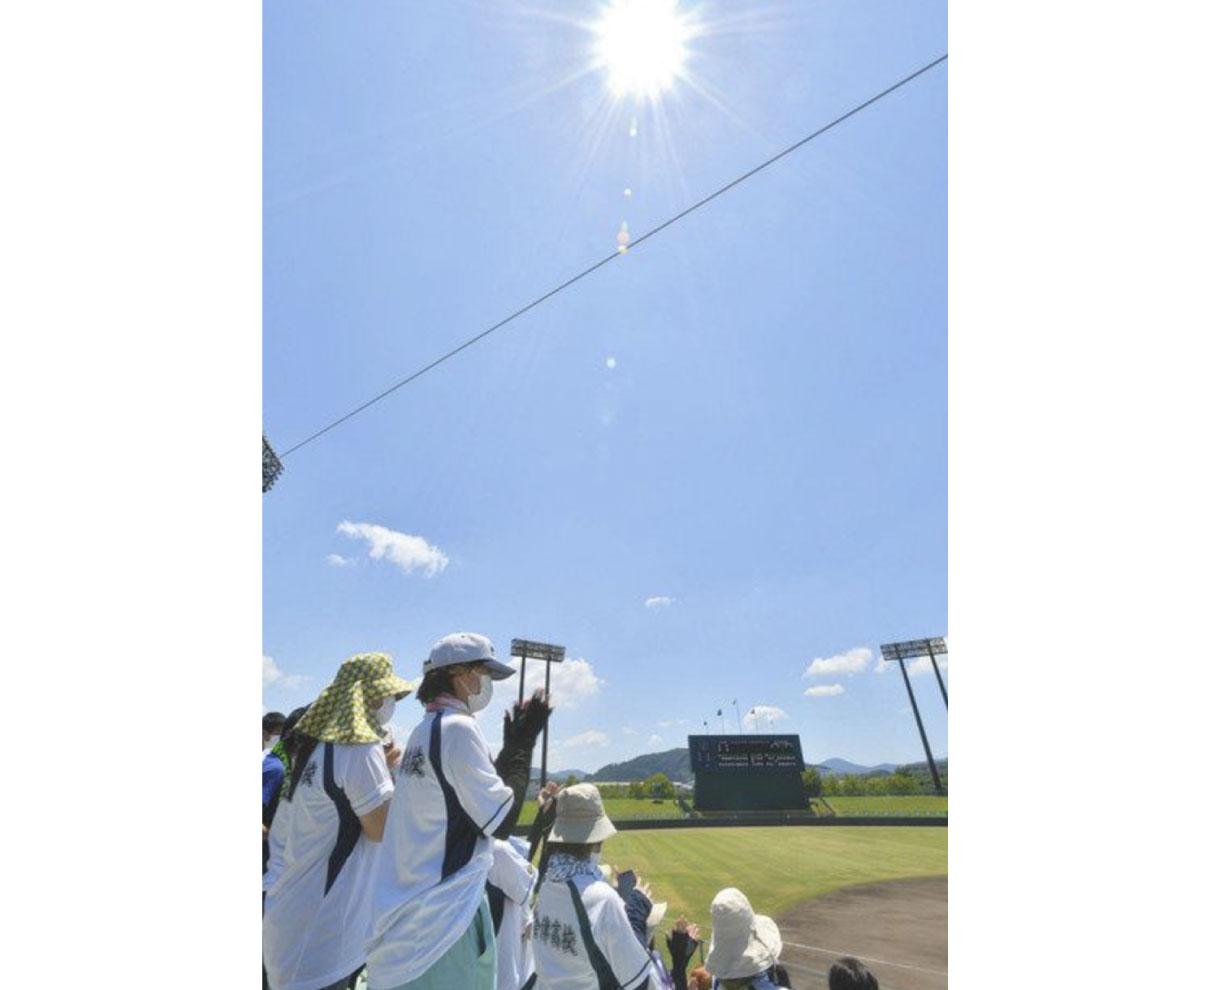 県内に熱中症警戒アラート 小浜36.5度 今季初猛暑日